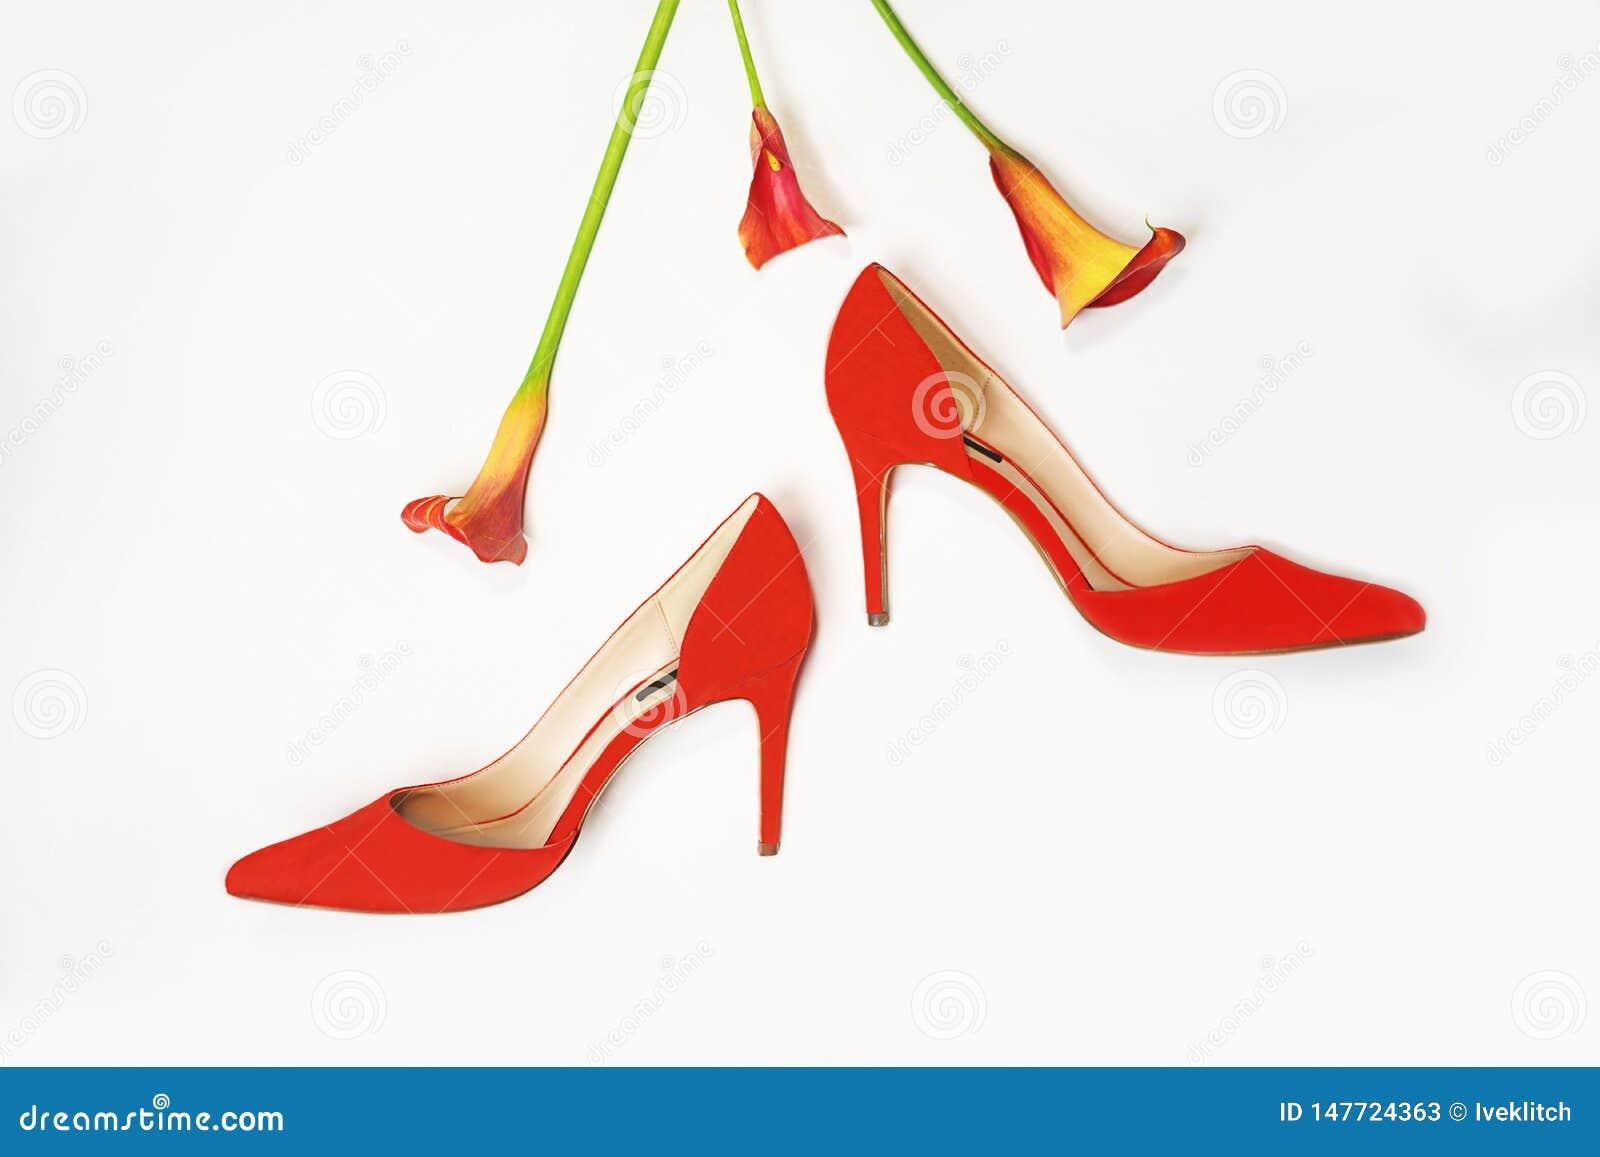 Female Stylish Accessories Fashion